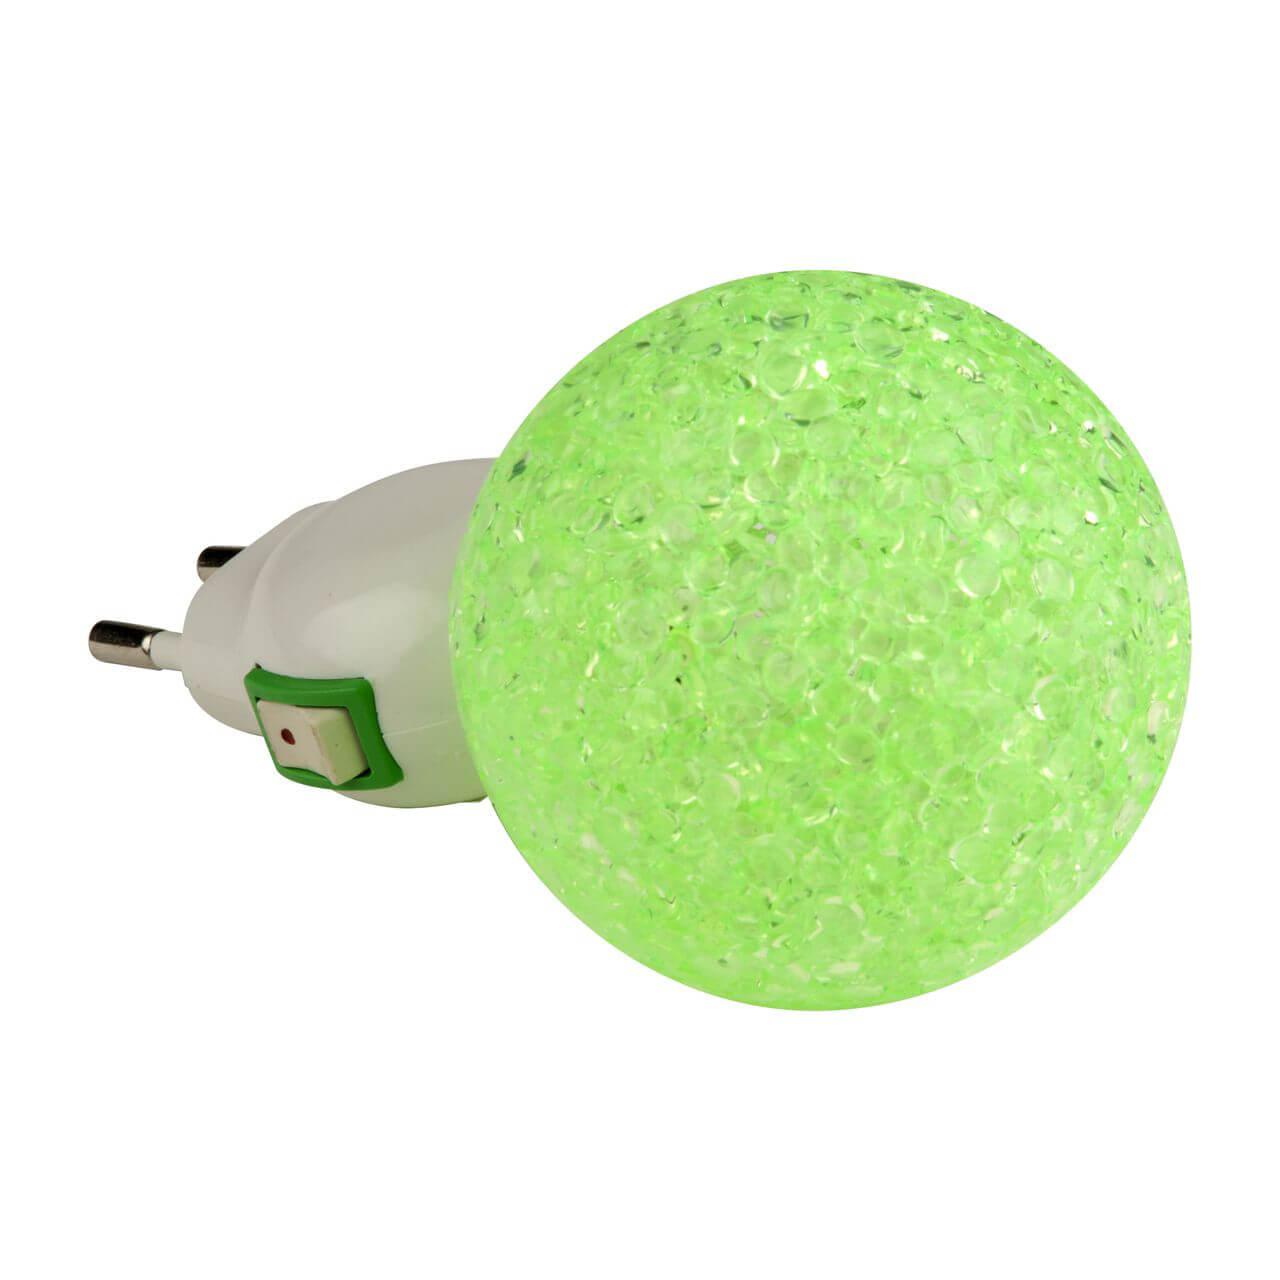 Светильник Uniel DTL-309-Шар/Green/1LED/0,1W DTL-309